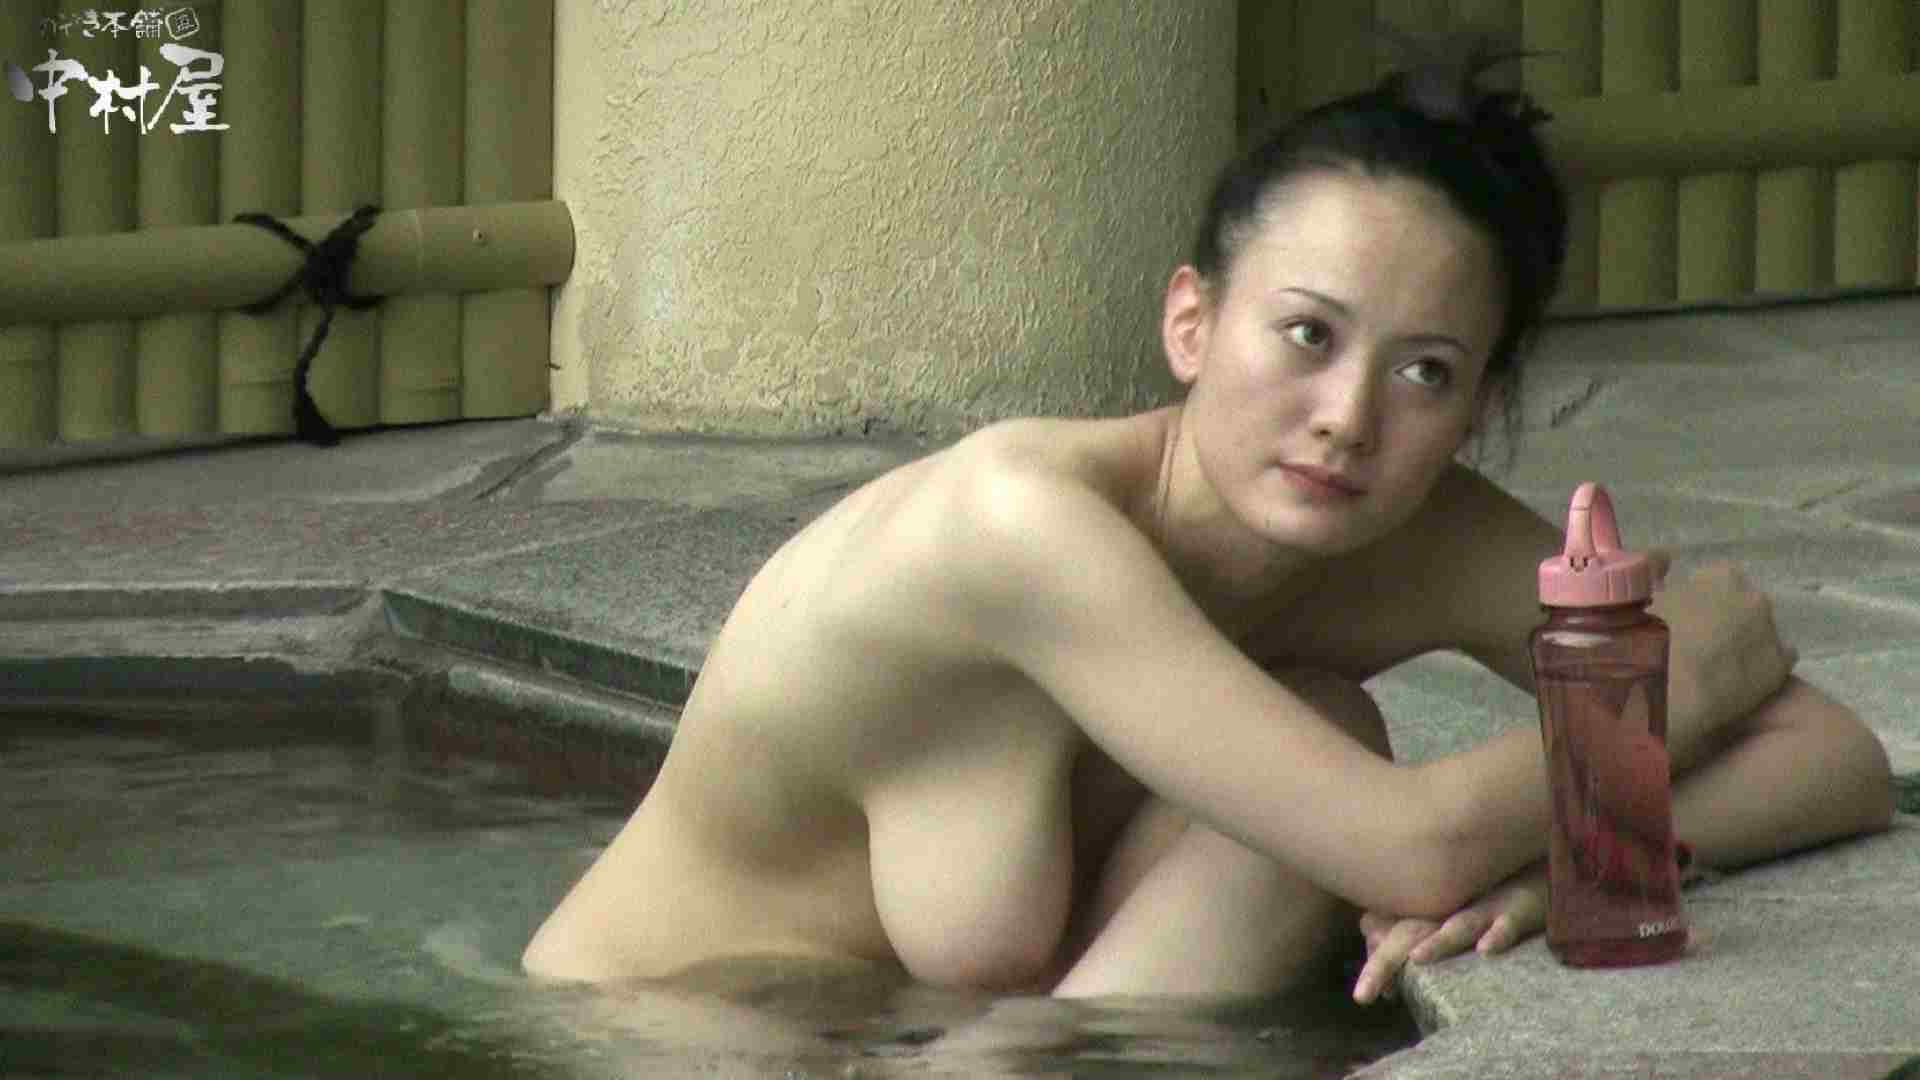 Aquaな露天風呂Vol.900 盗撮師作品 ヌード画像 86pic 71